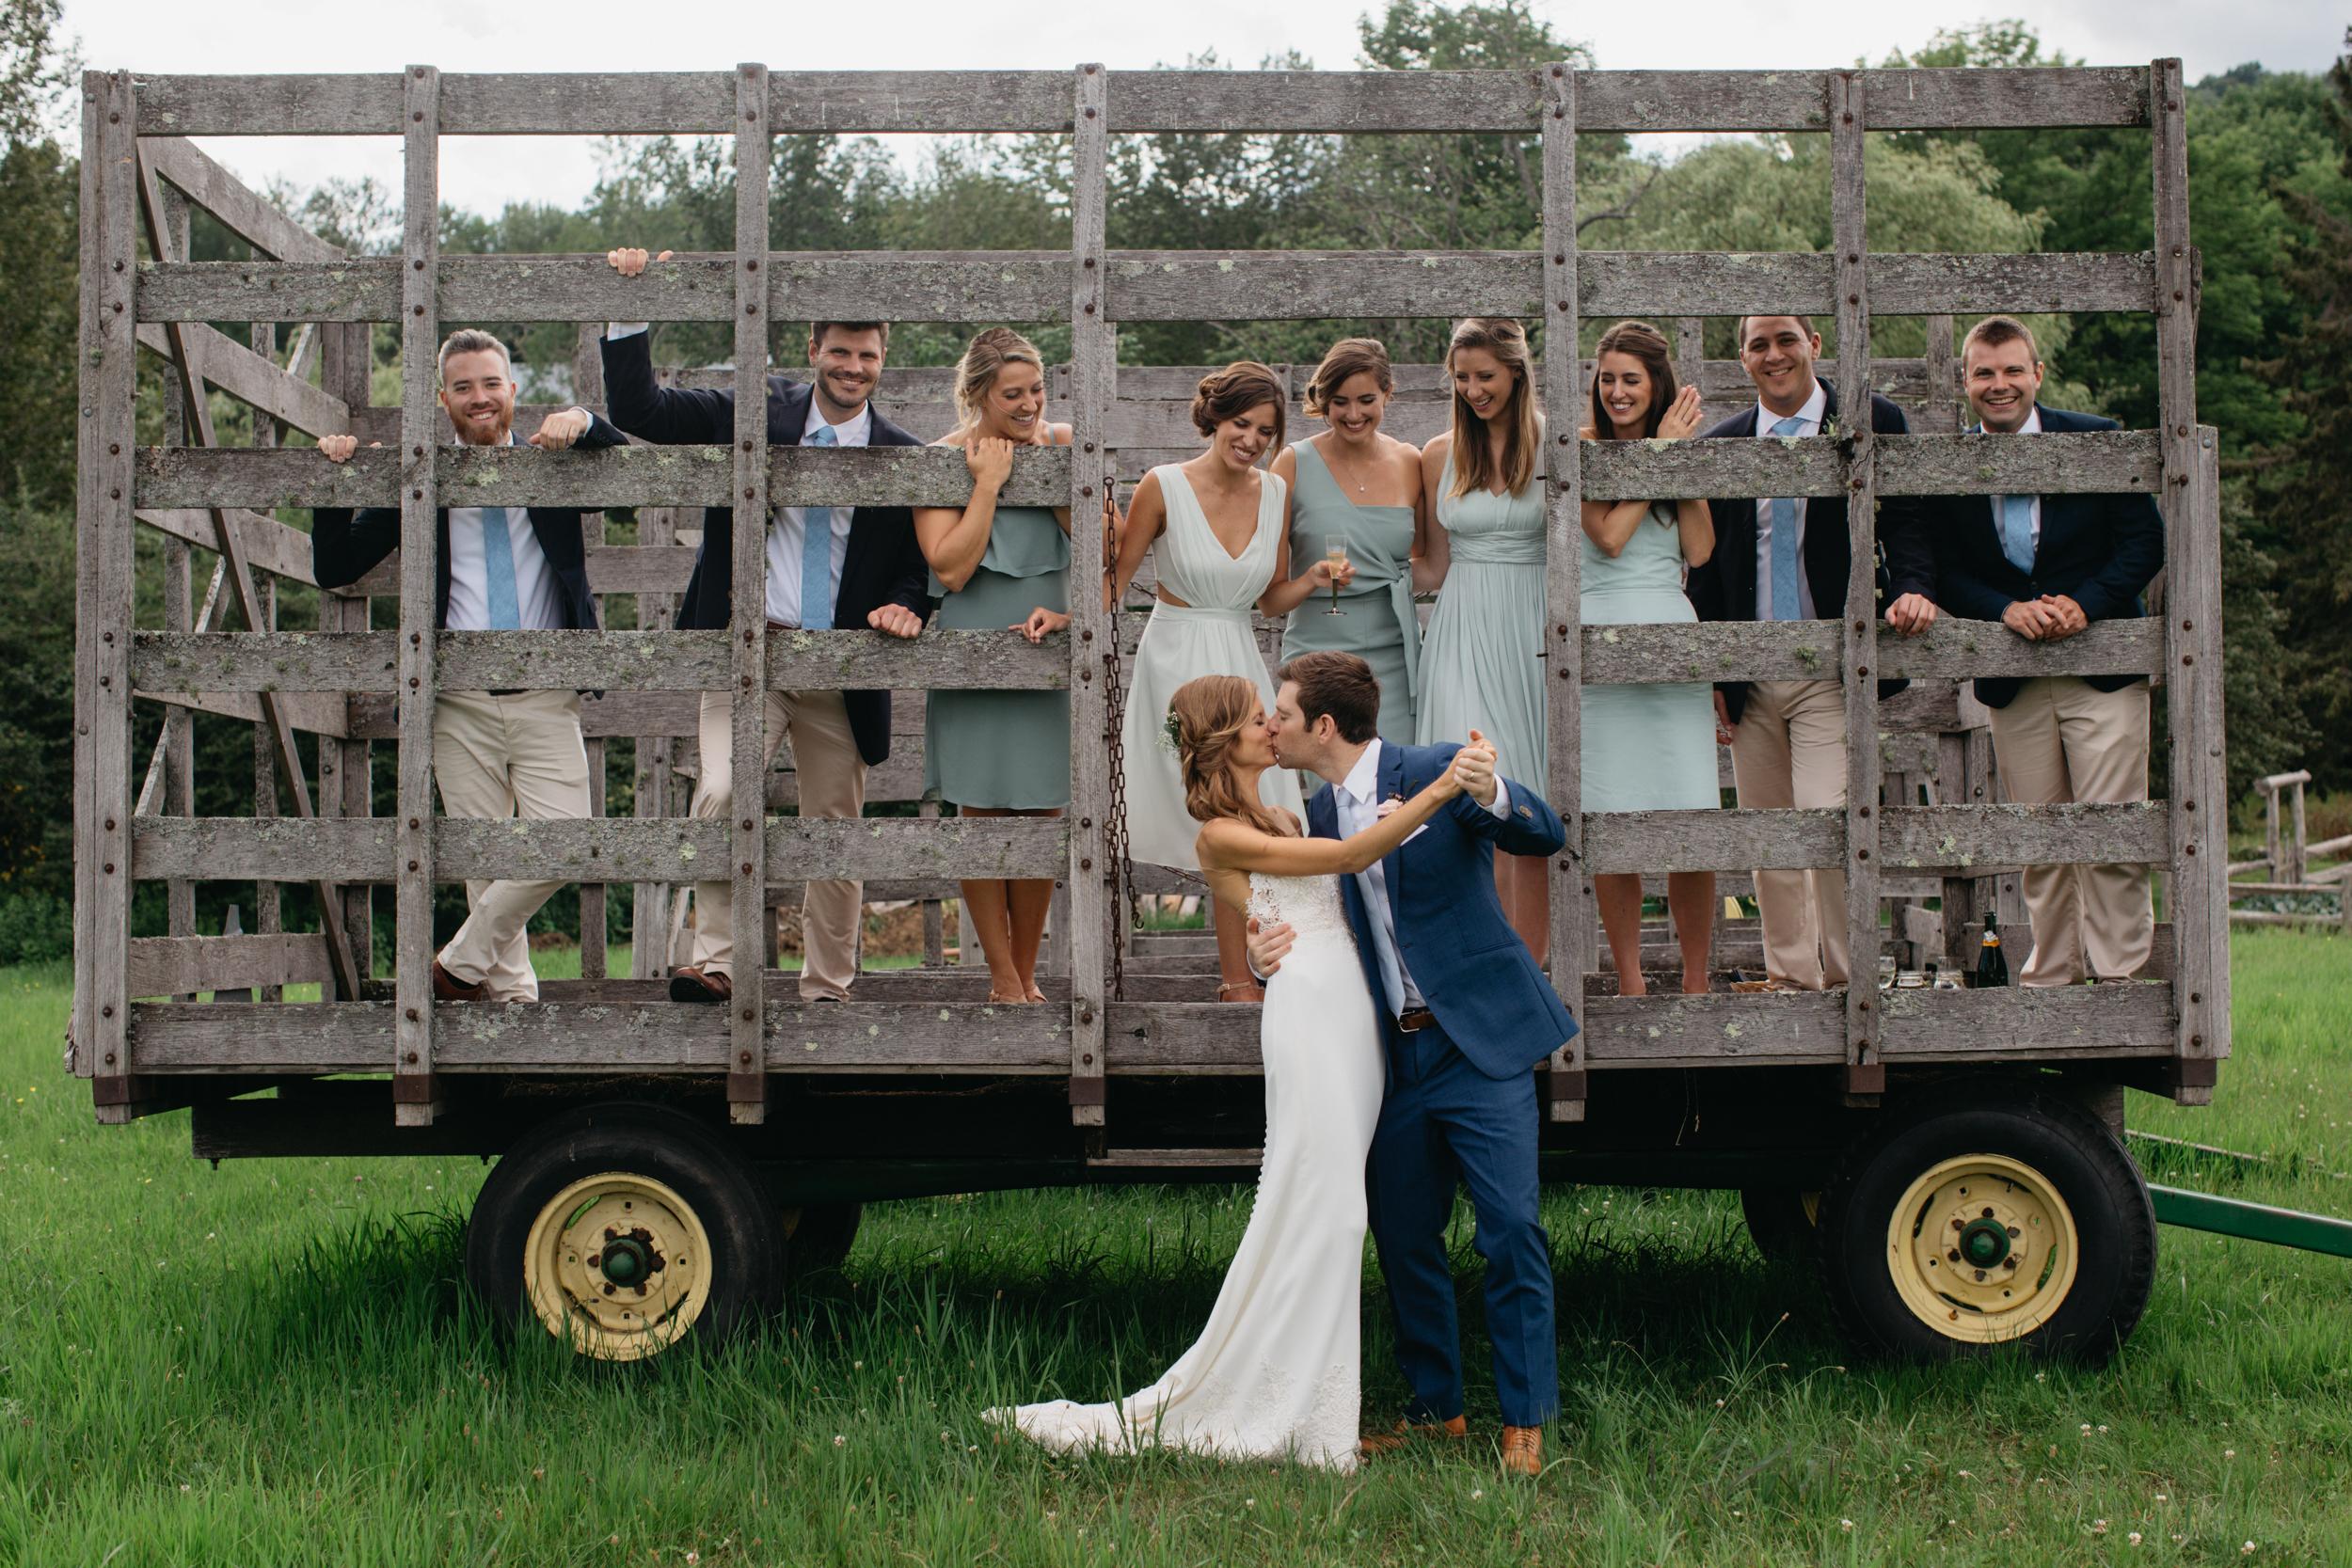 Karen_Alex_Bliss_ridge_farm_Vermont_wedding022.jpg